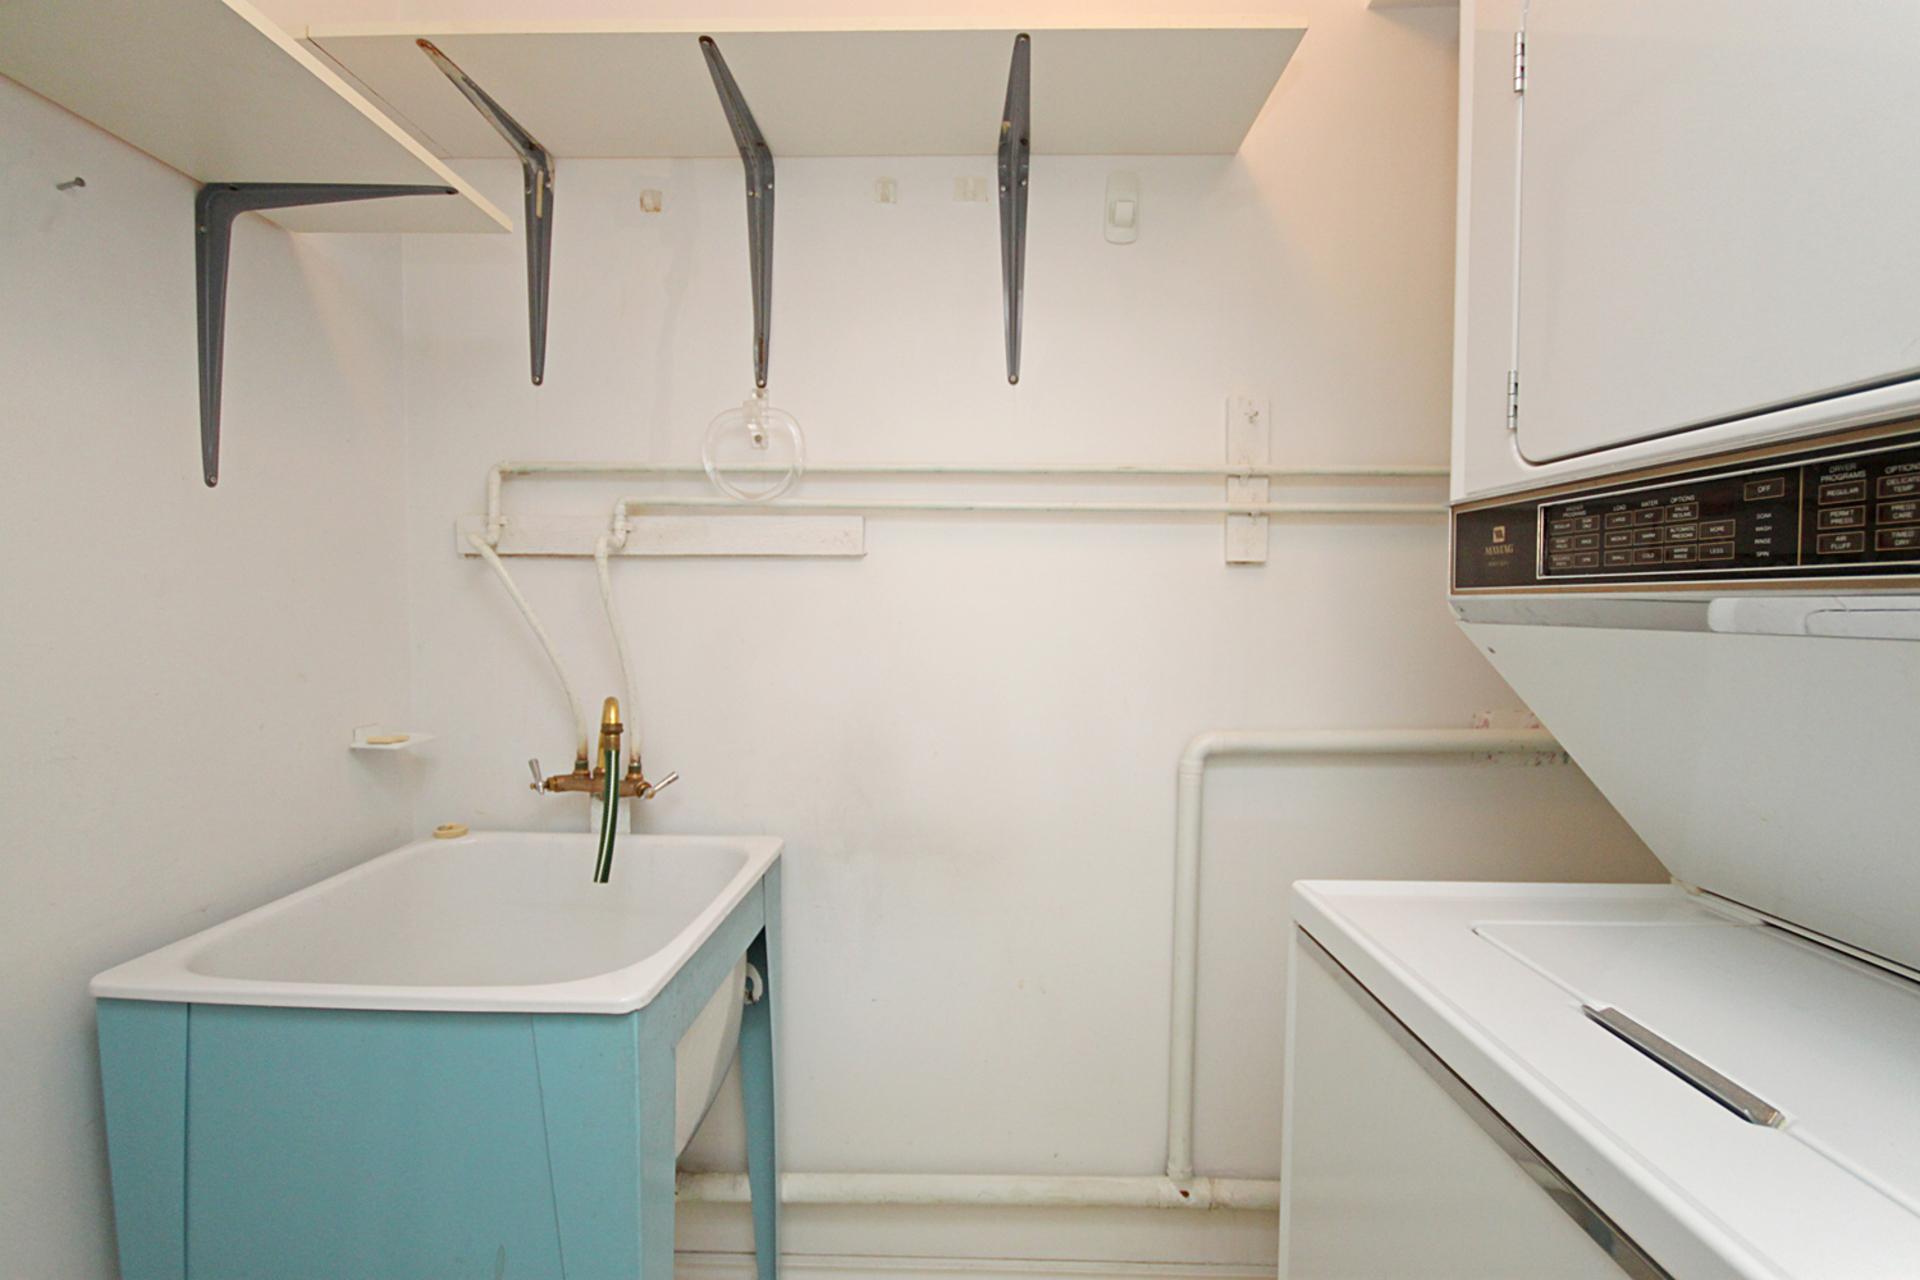 Laundry Room at 519 - 1200 Don Mills Road, Banbury-Don Mills, Toronto